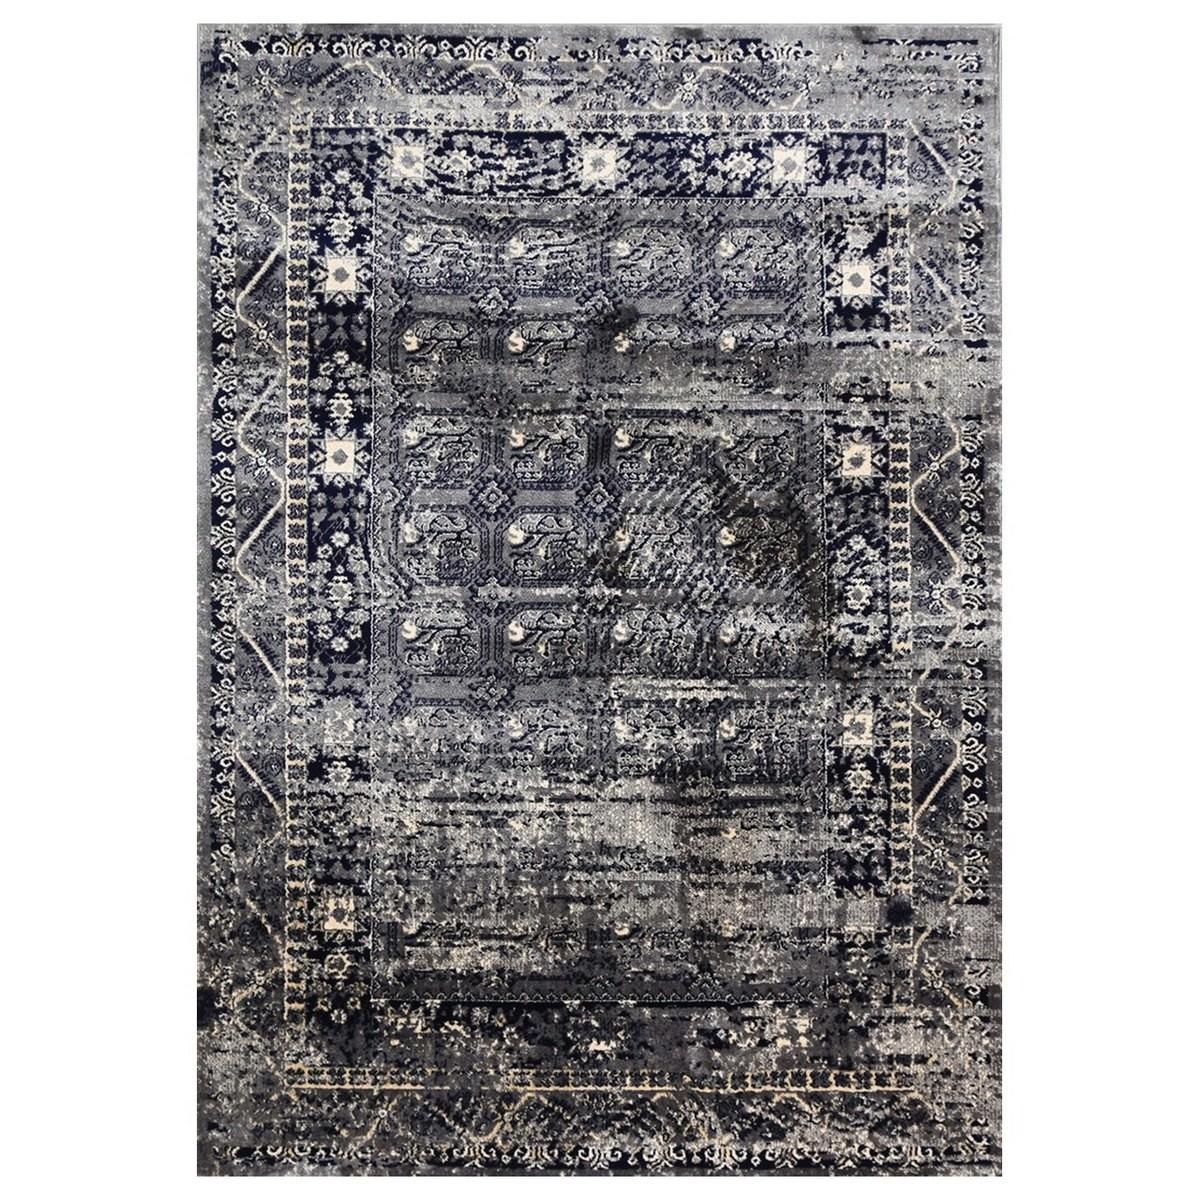 Artifact Cyrus Distressed Oriental Rug, 160x230cm